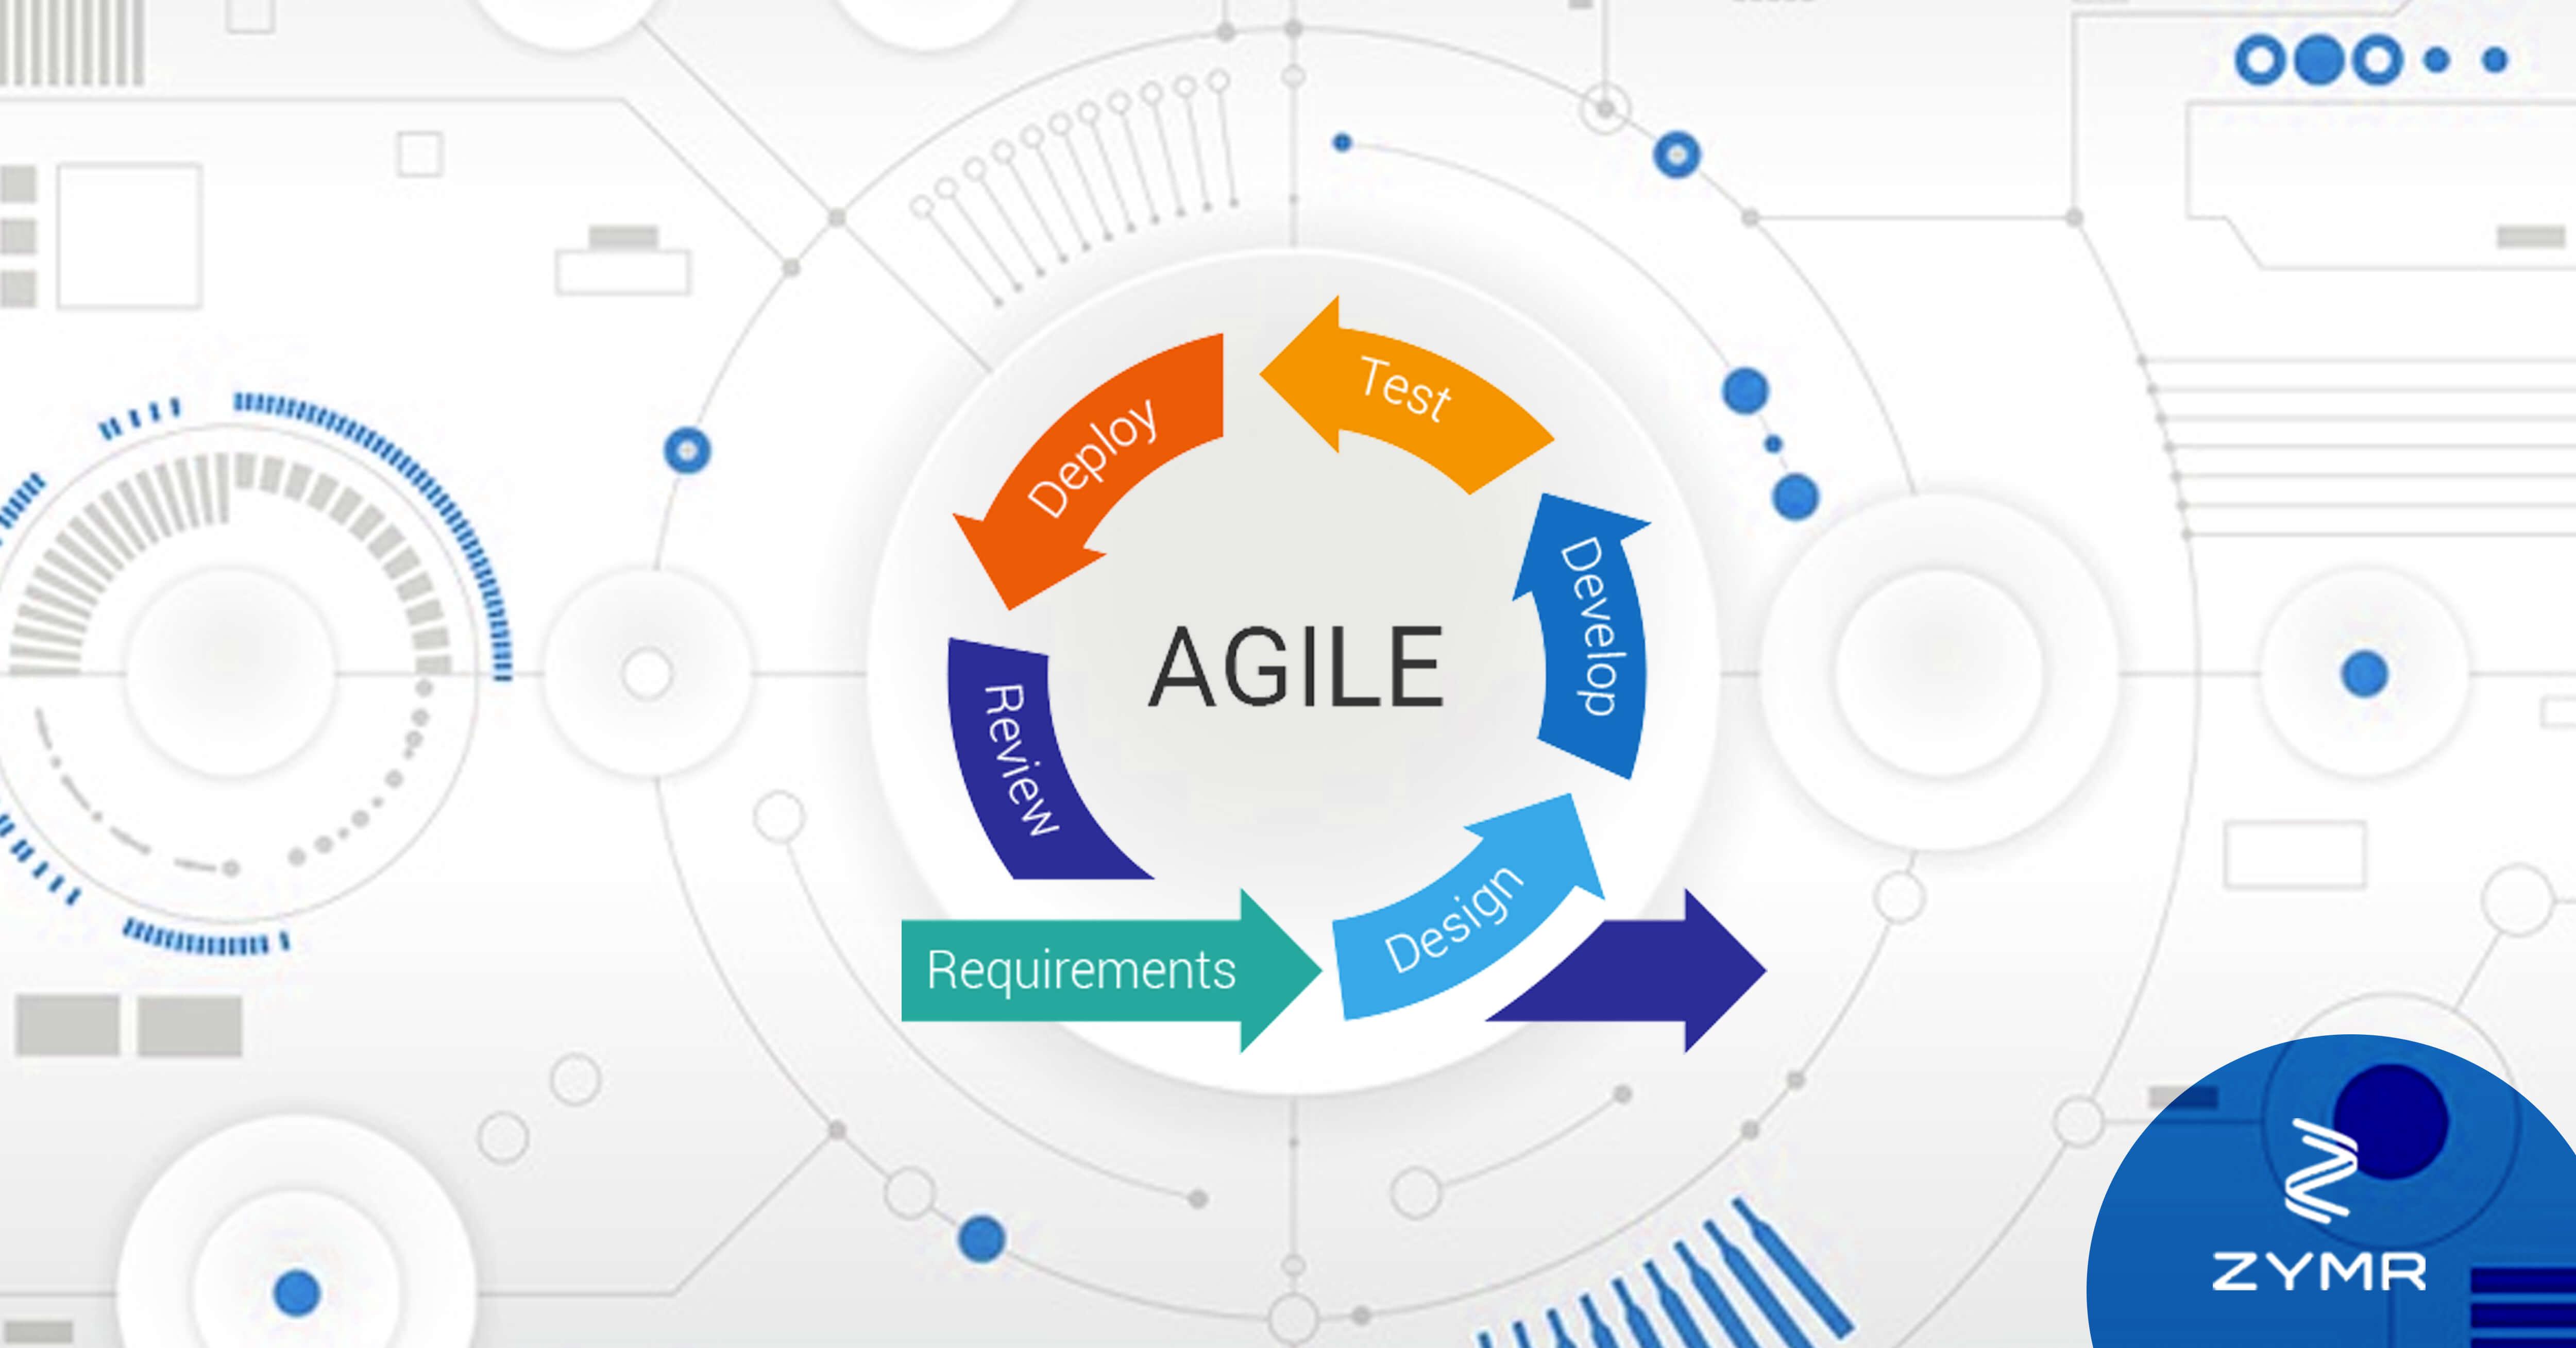 ZYMR Agile-Development services